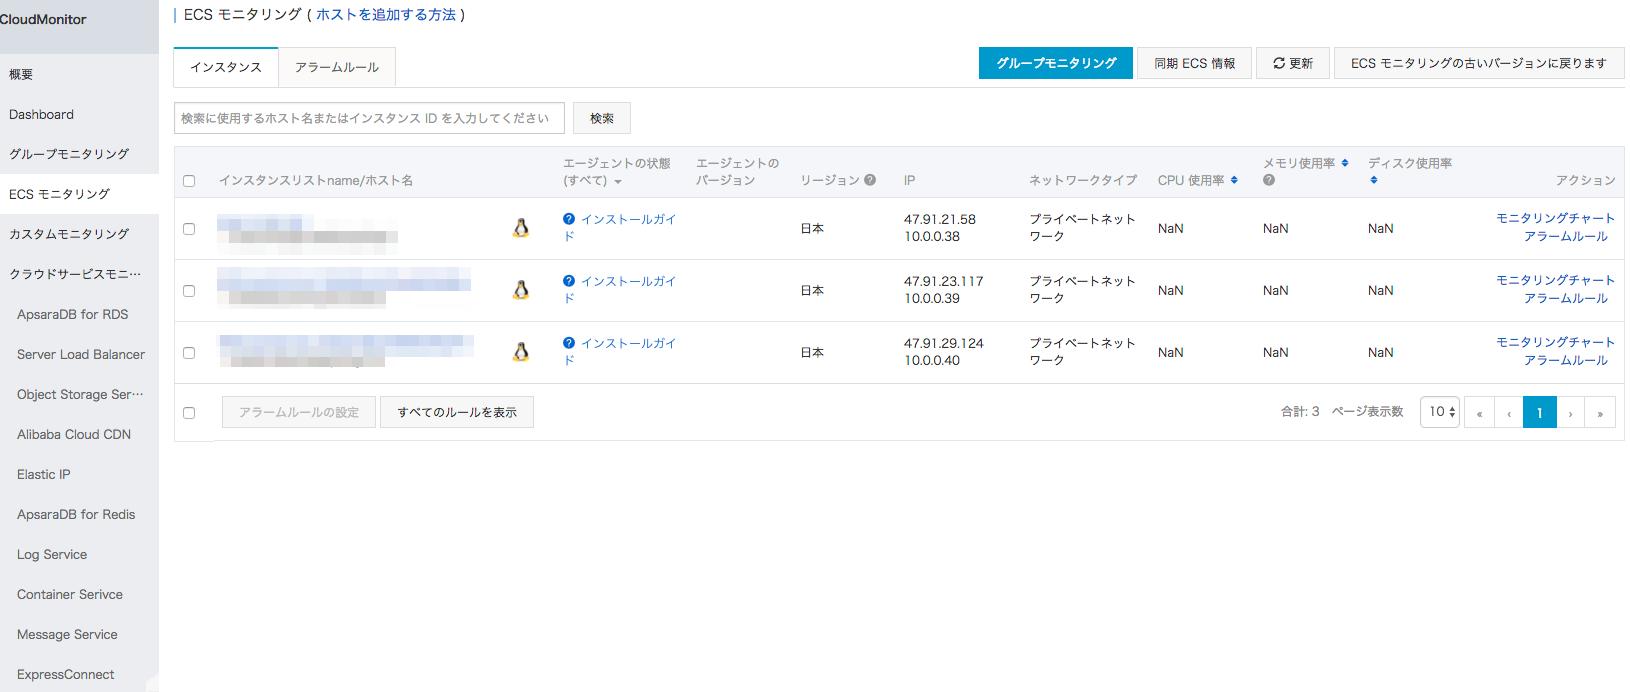 CloudMonitor_管理コンソール 3.png